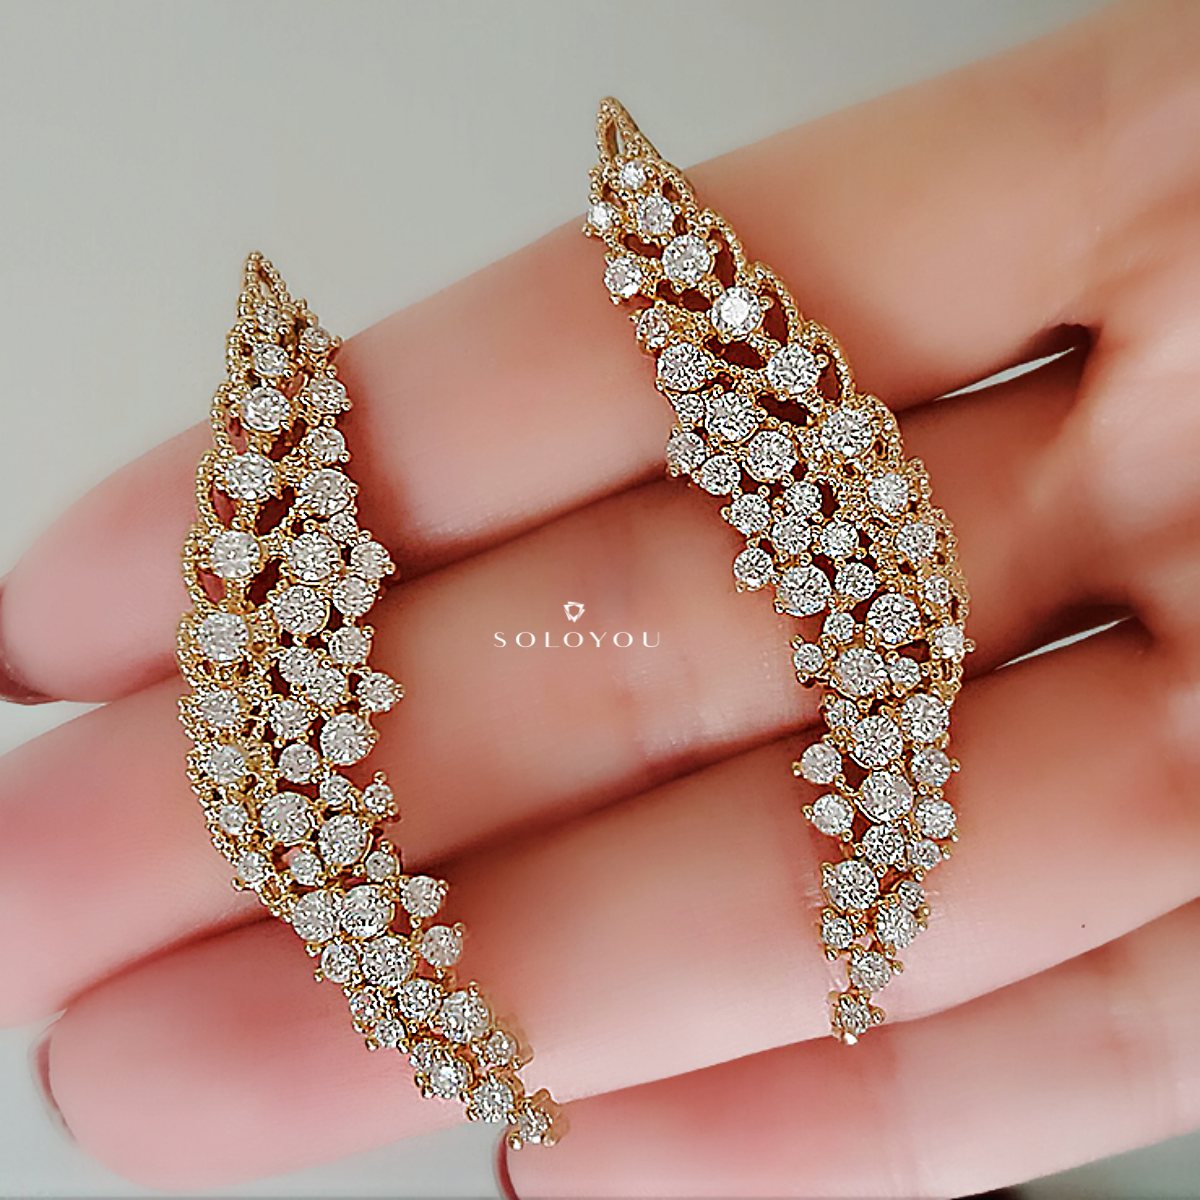 Ear Cuff Asa Luxo Semijoia em Ouro 18K com Zircônia Branca  - SOLOYOU